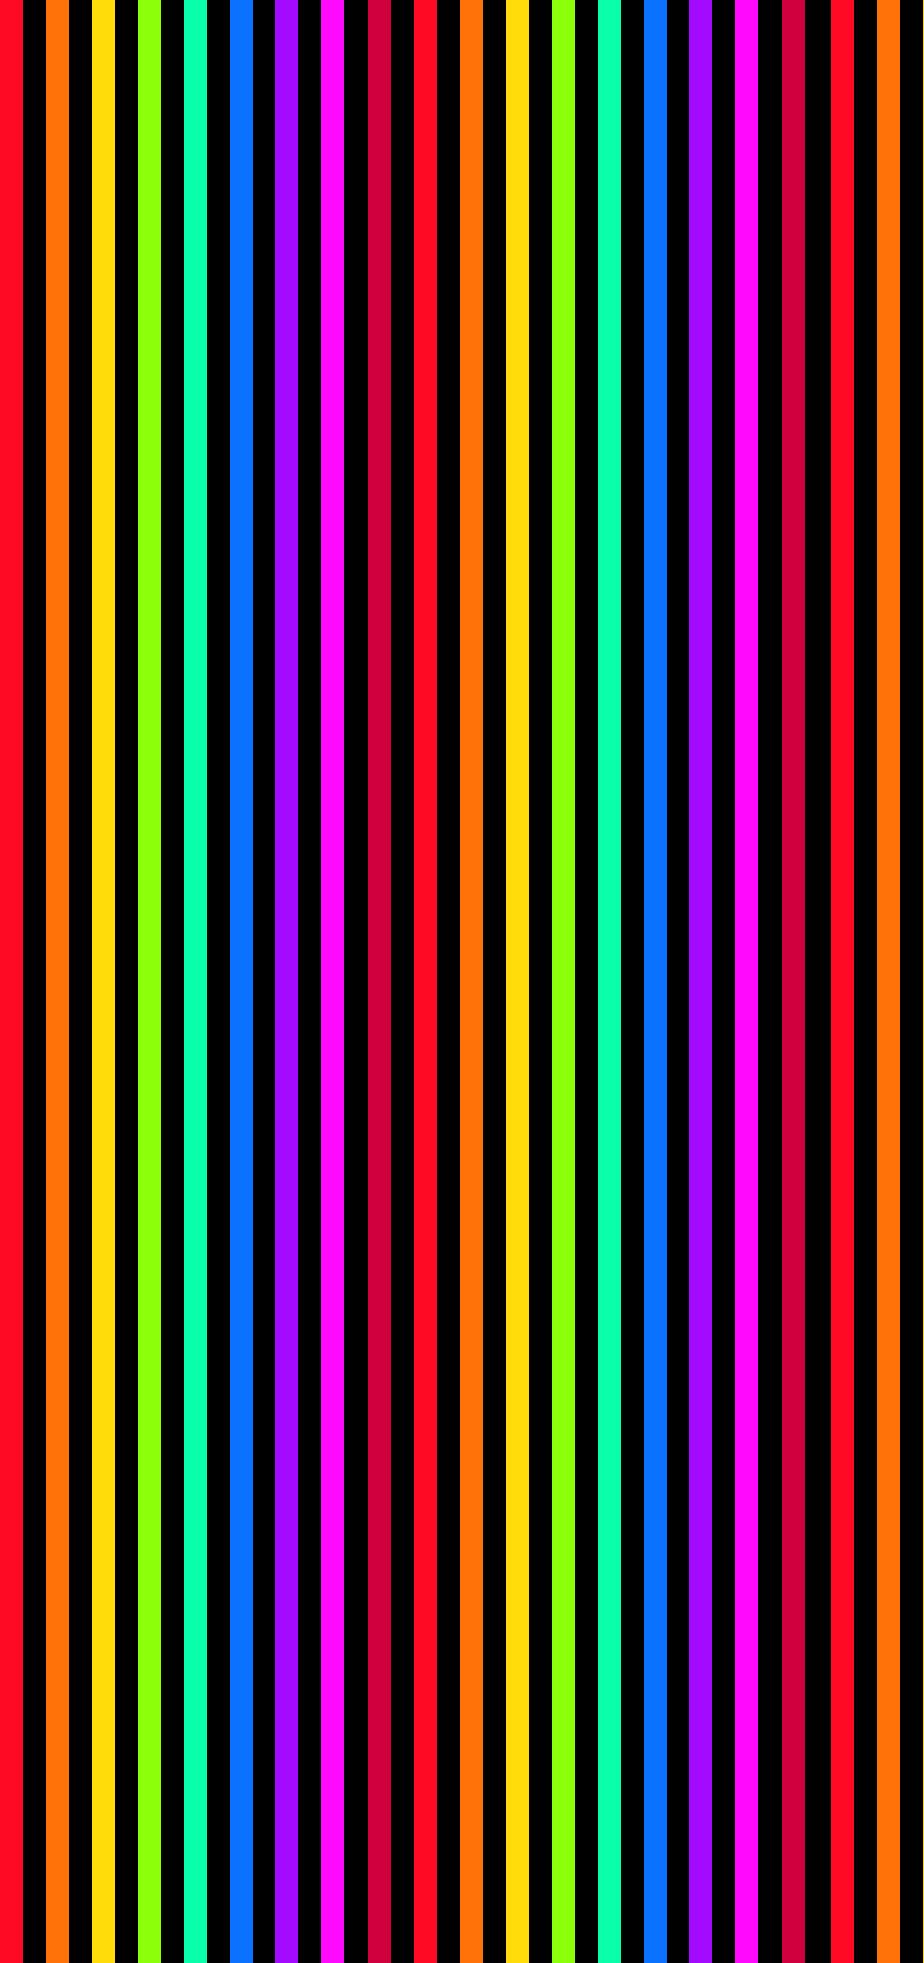 pin free rainbow 6 patriots wallpaper in 1366x768 on pinterest